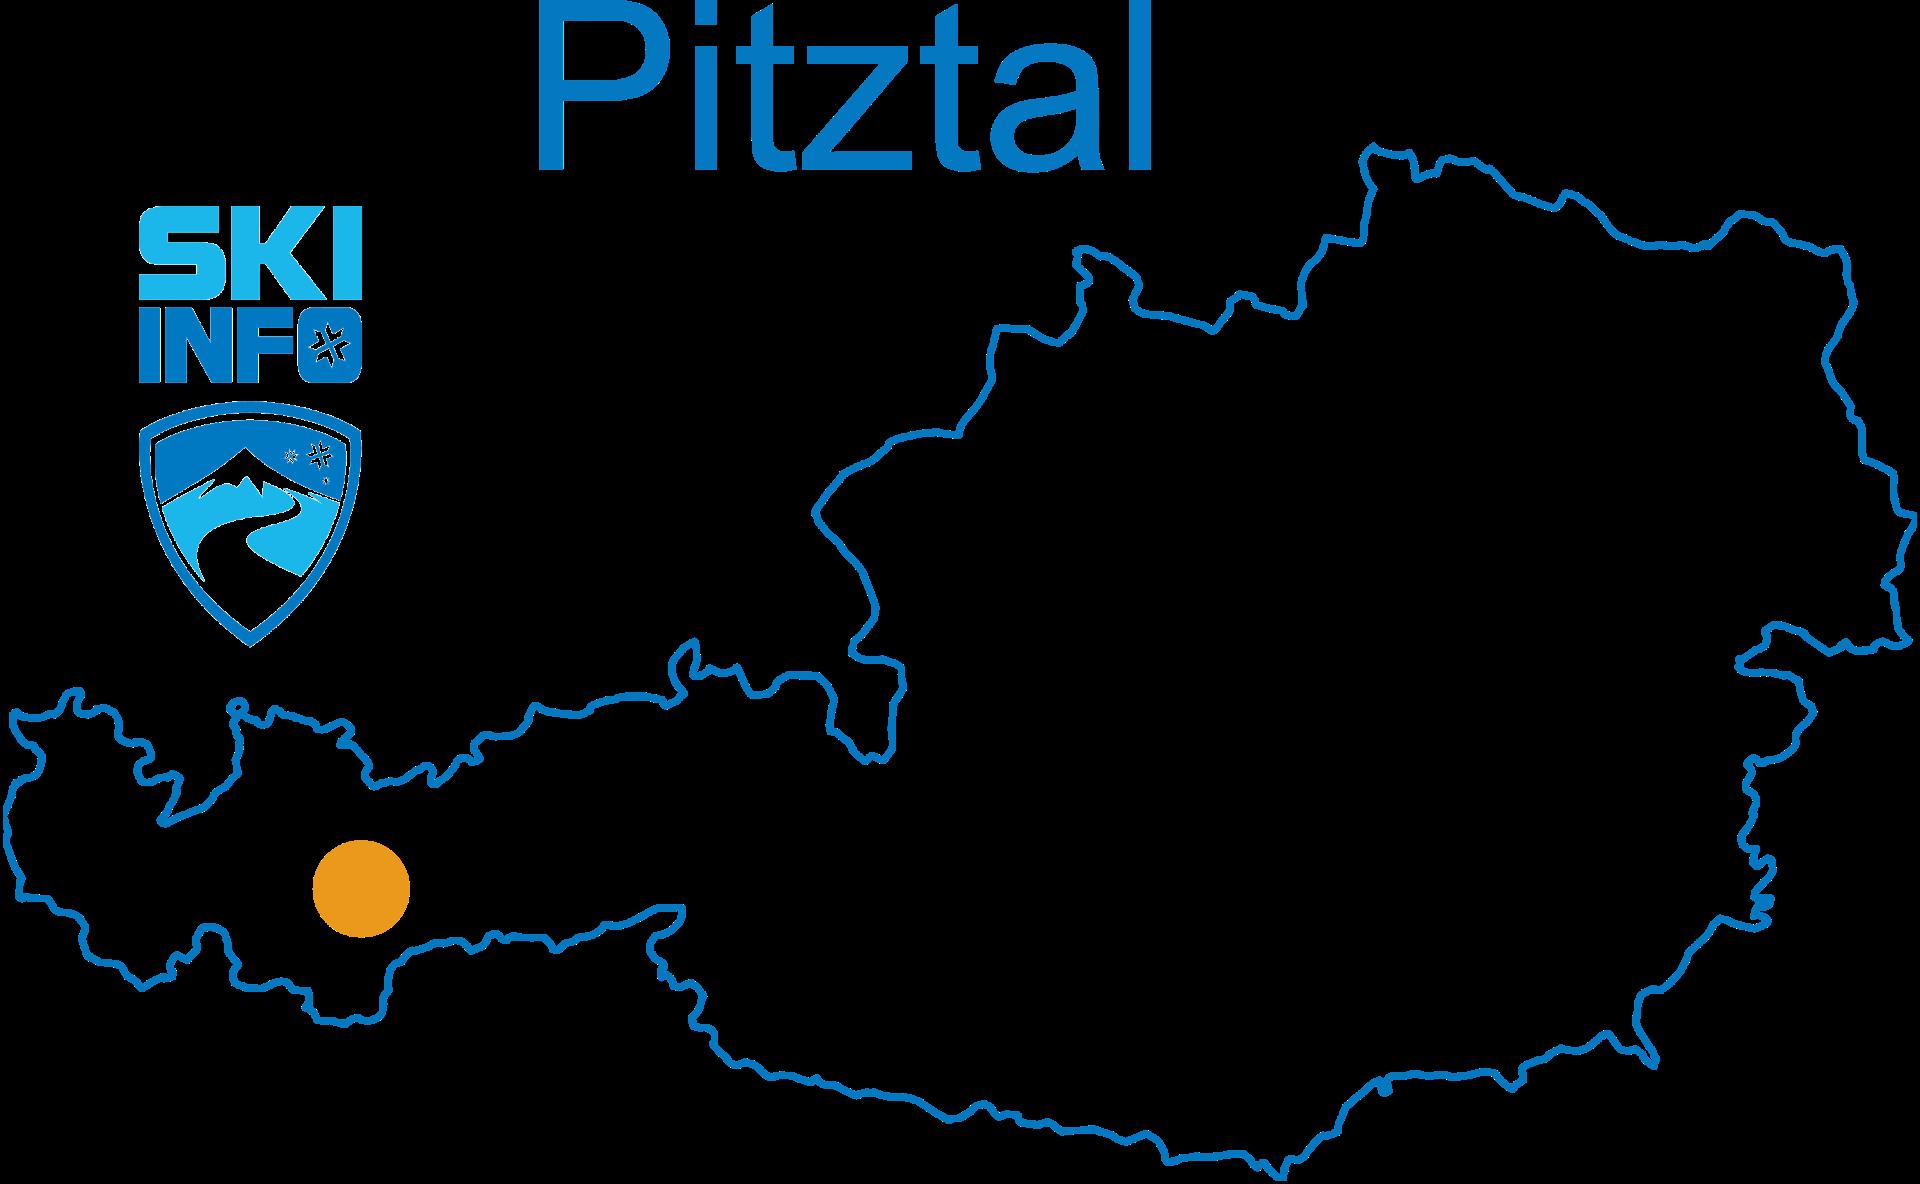 Karte Pitztal